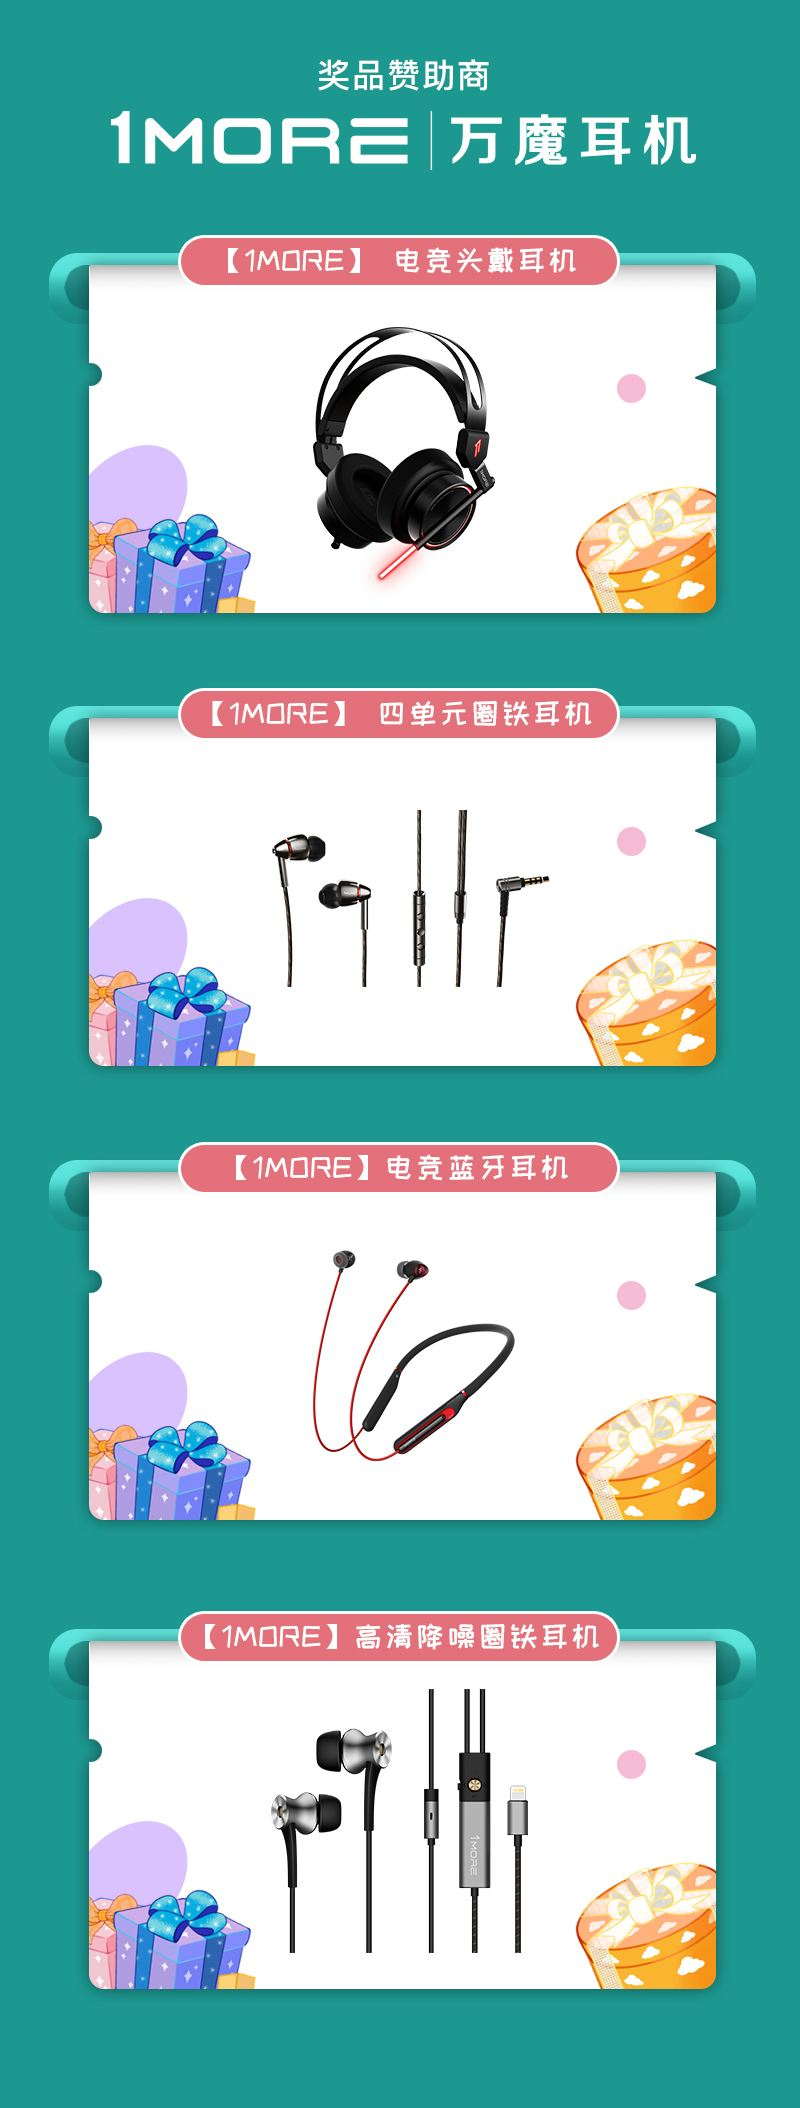 2019 ChinaJoy 封面大赛第五周周优秀票选结果公布